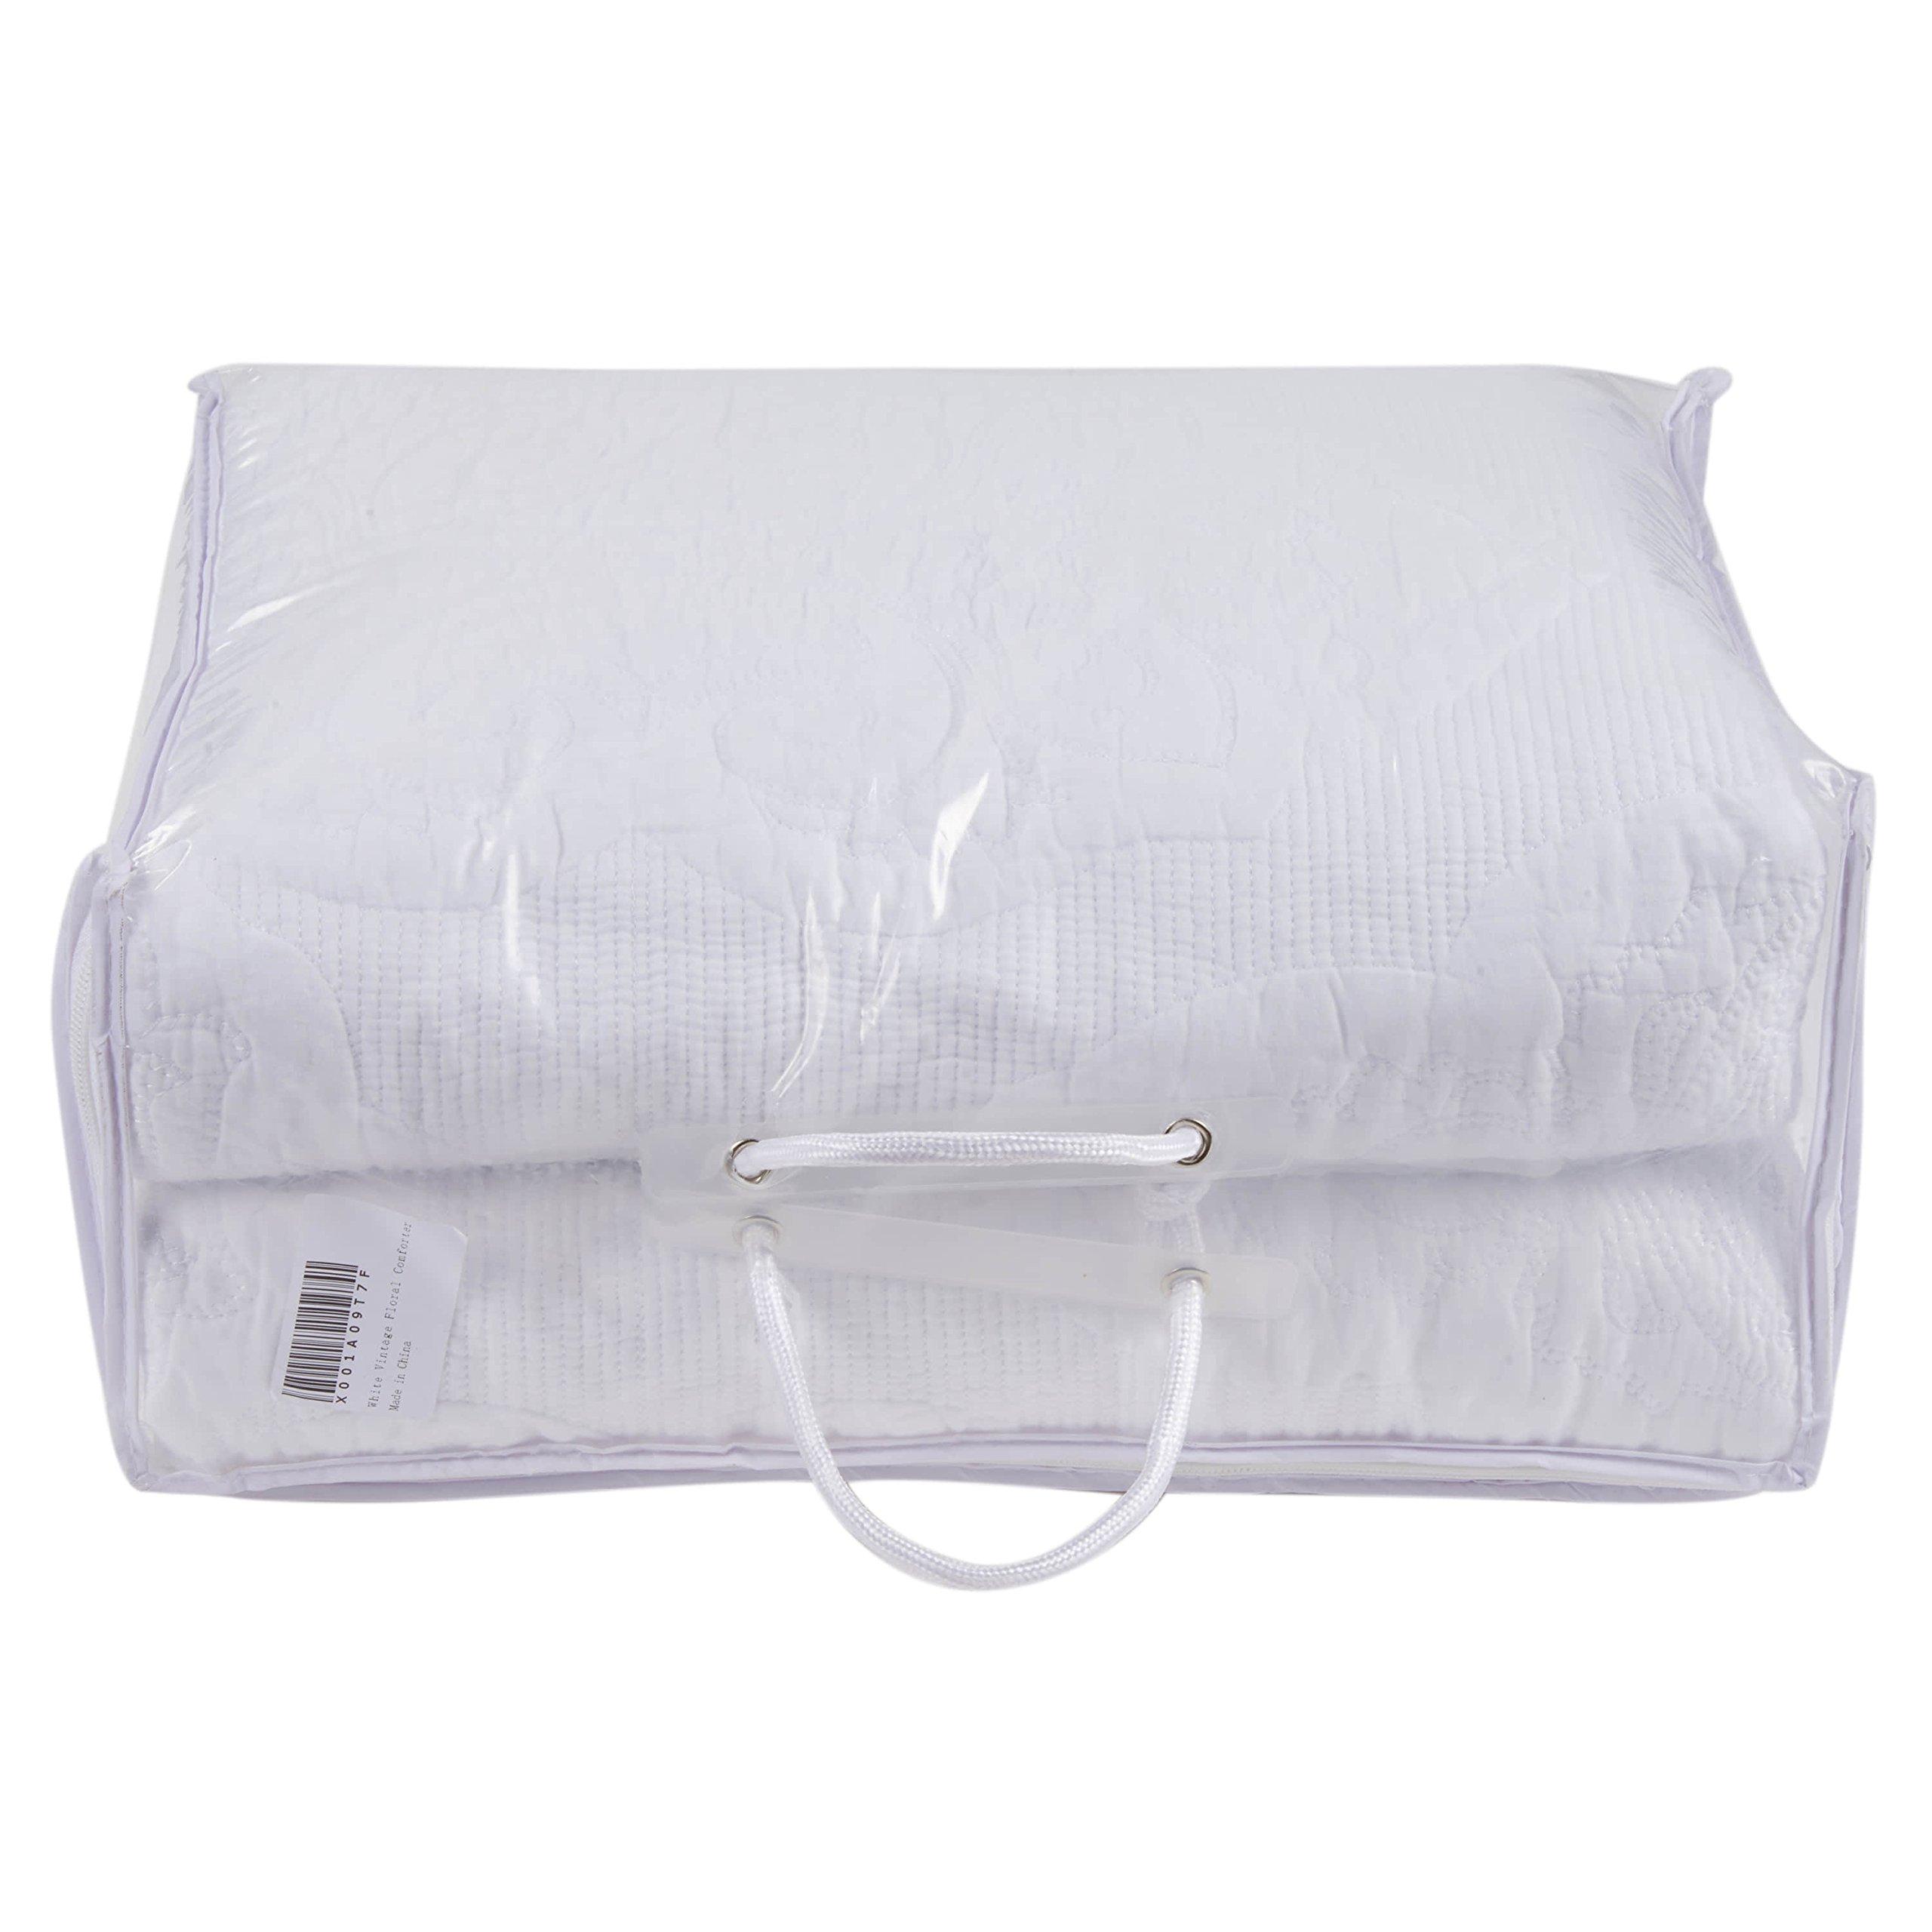 Moldiy White Pulis Embroideried Exquisite Floral Pattern Cotton Quilt Sets,Quilt and Pillow Shams,3 Pcs,King